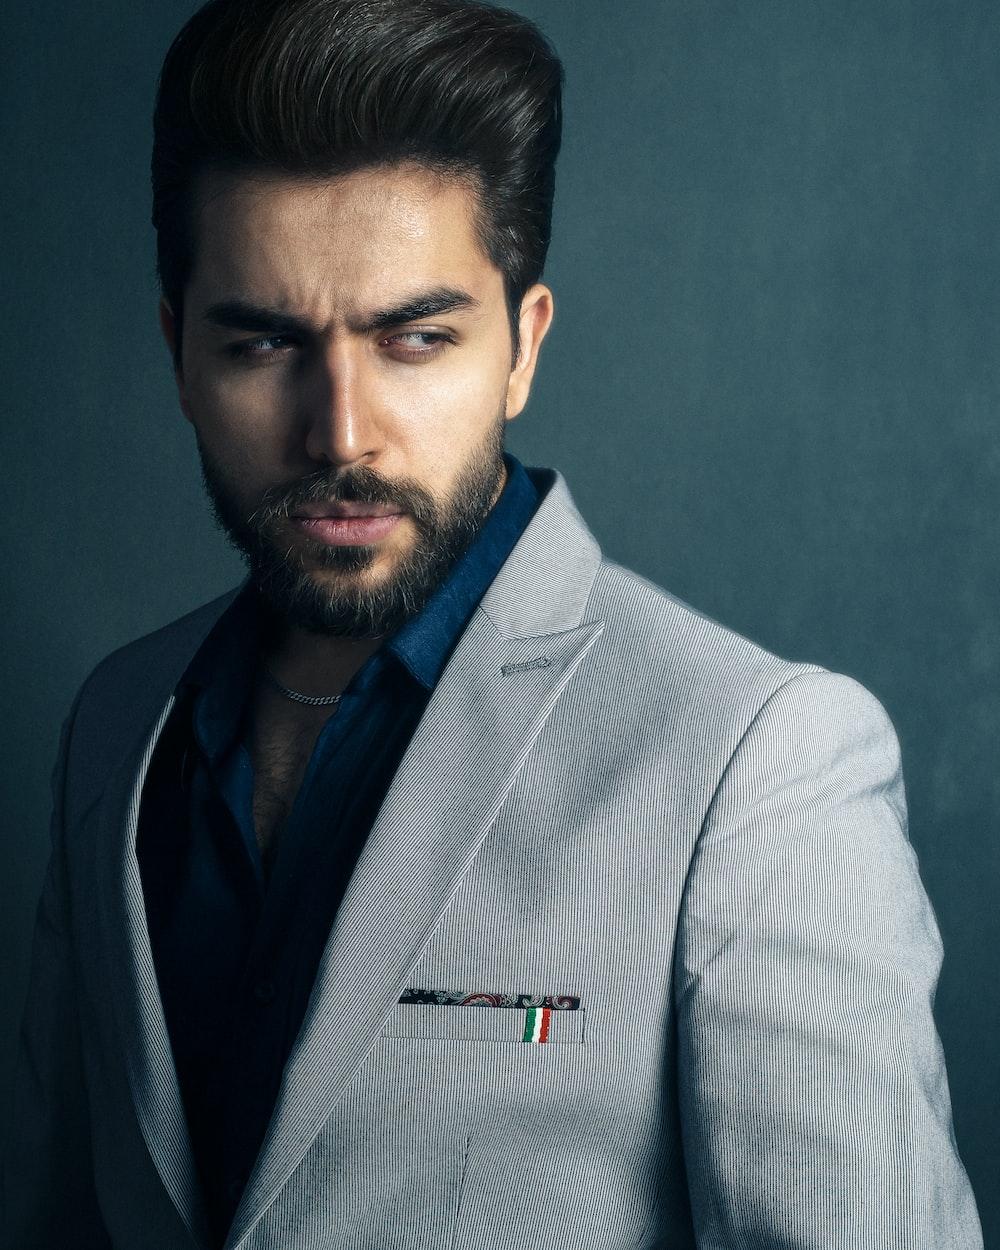 man in gray suit jacket